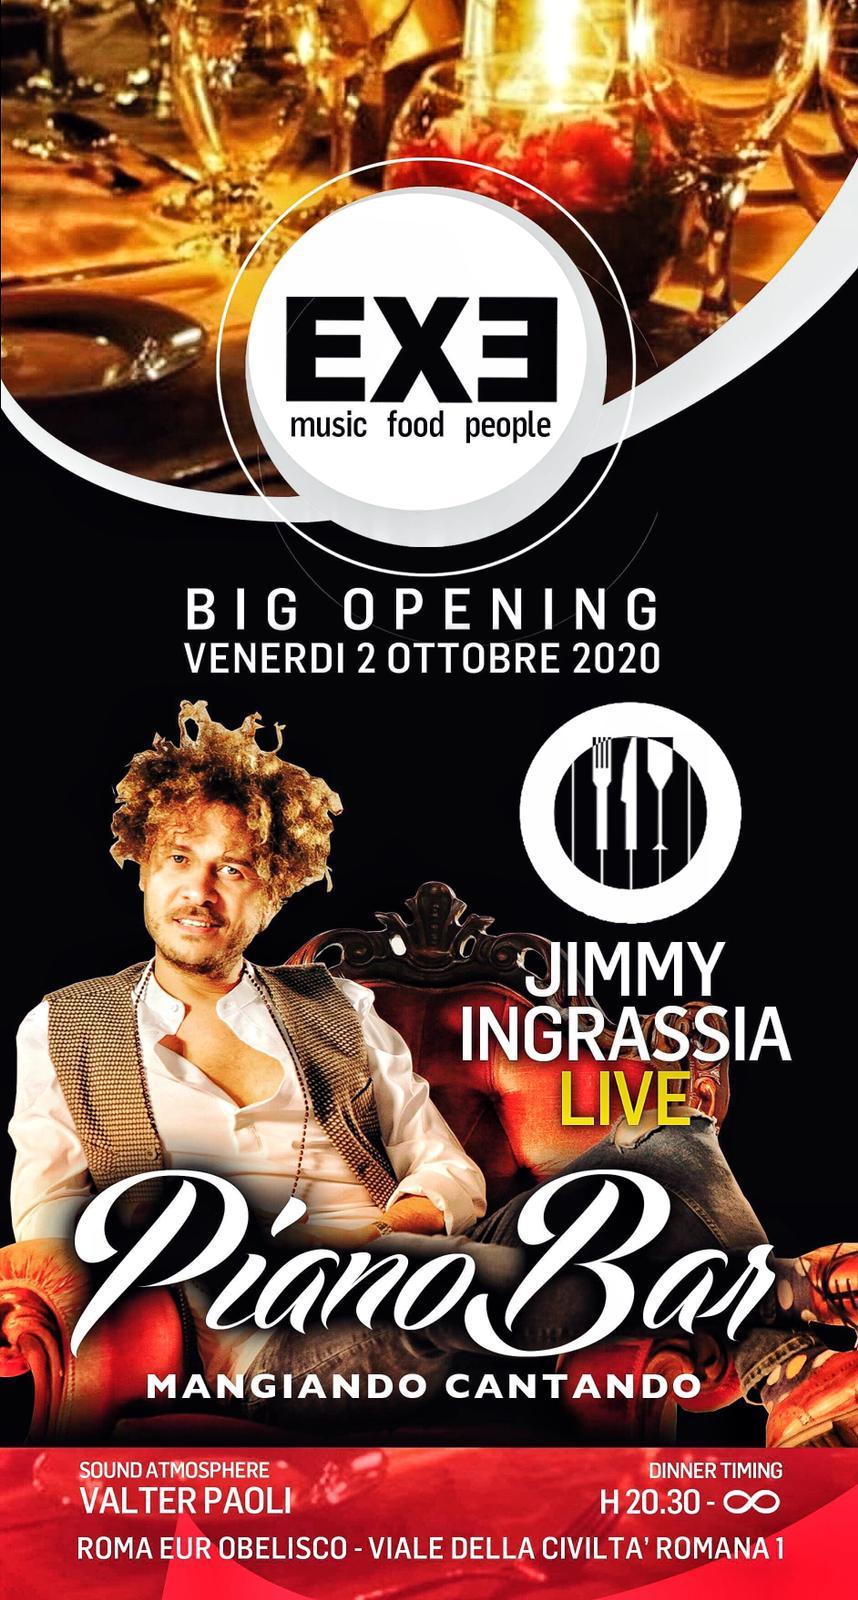 BIG OPENING Exe Eur venerdì 2 ottobre 2020 Dinner + Piano Bar